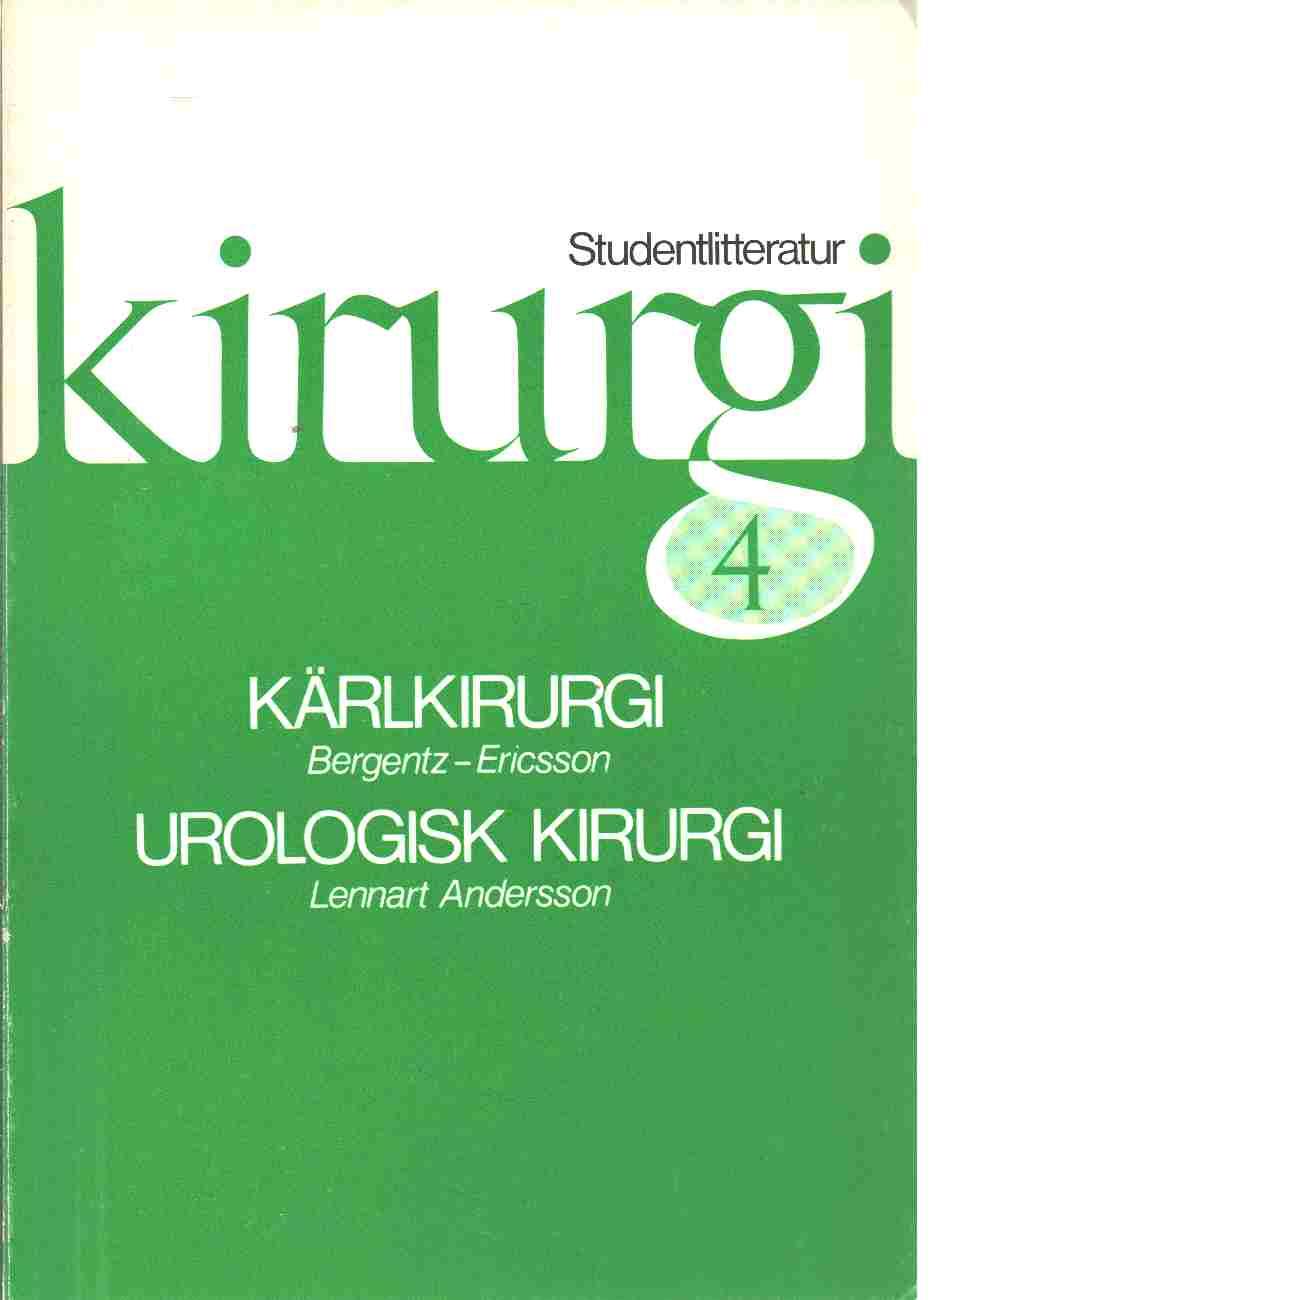 Kirurgi. 4 - Red. Bergentz, Sven-Erik och Ericsson, Björn F.,  samt Andersson, Lennart